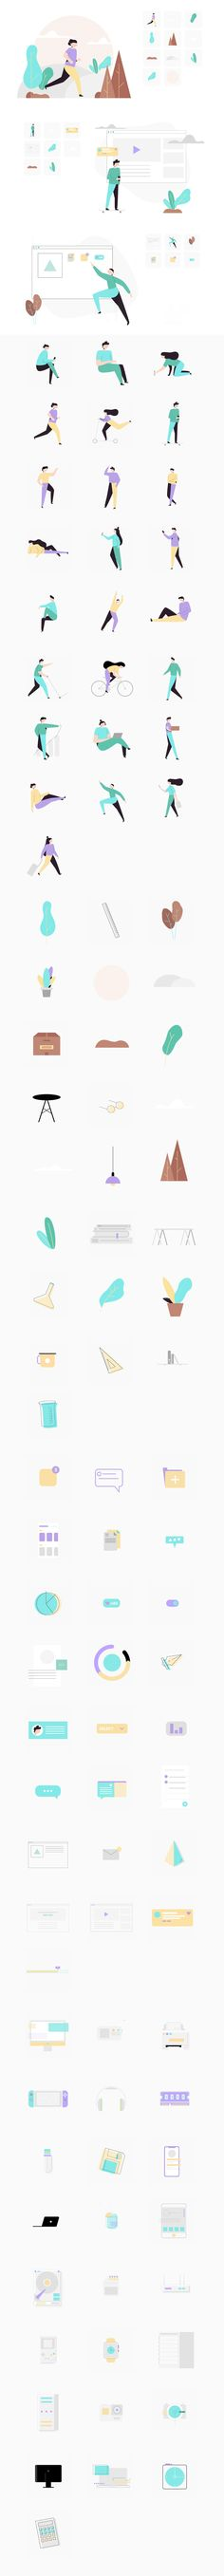 Peach - 100+ Free Illustration System - uistore.design Flat Design Illustration, Free Illustrations, 100 Free, Peach, Bullet Journal, Illustrator, Learning, Store, Studying